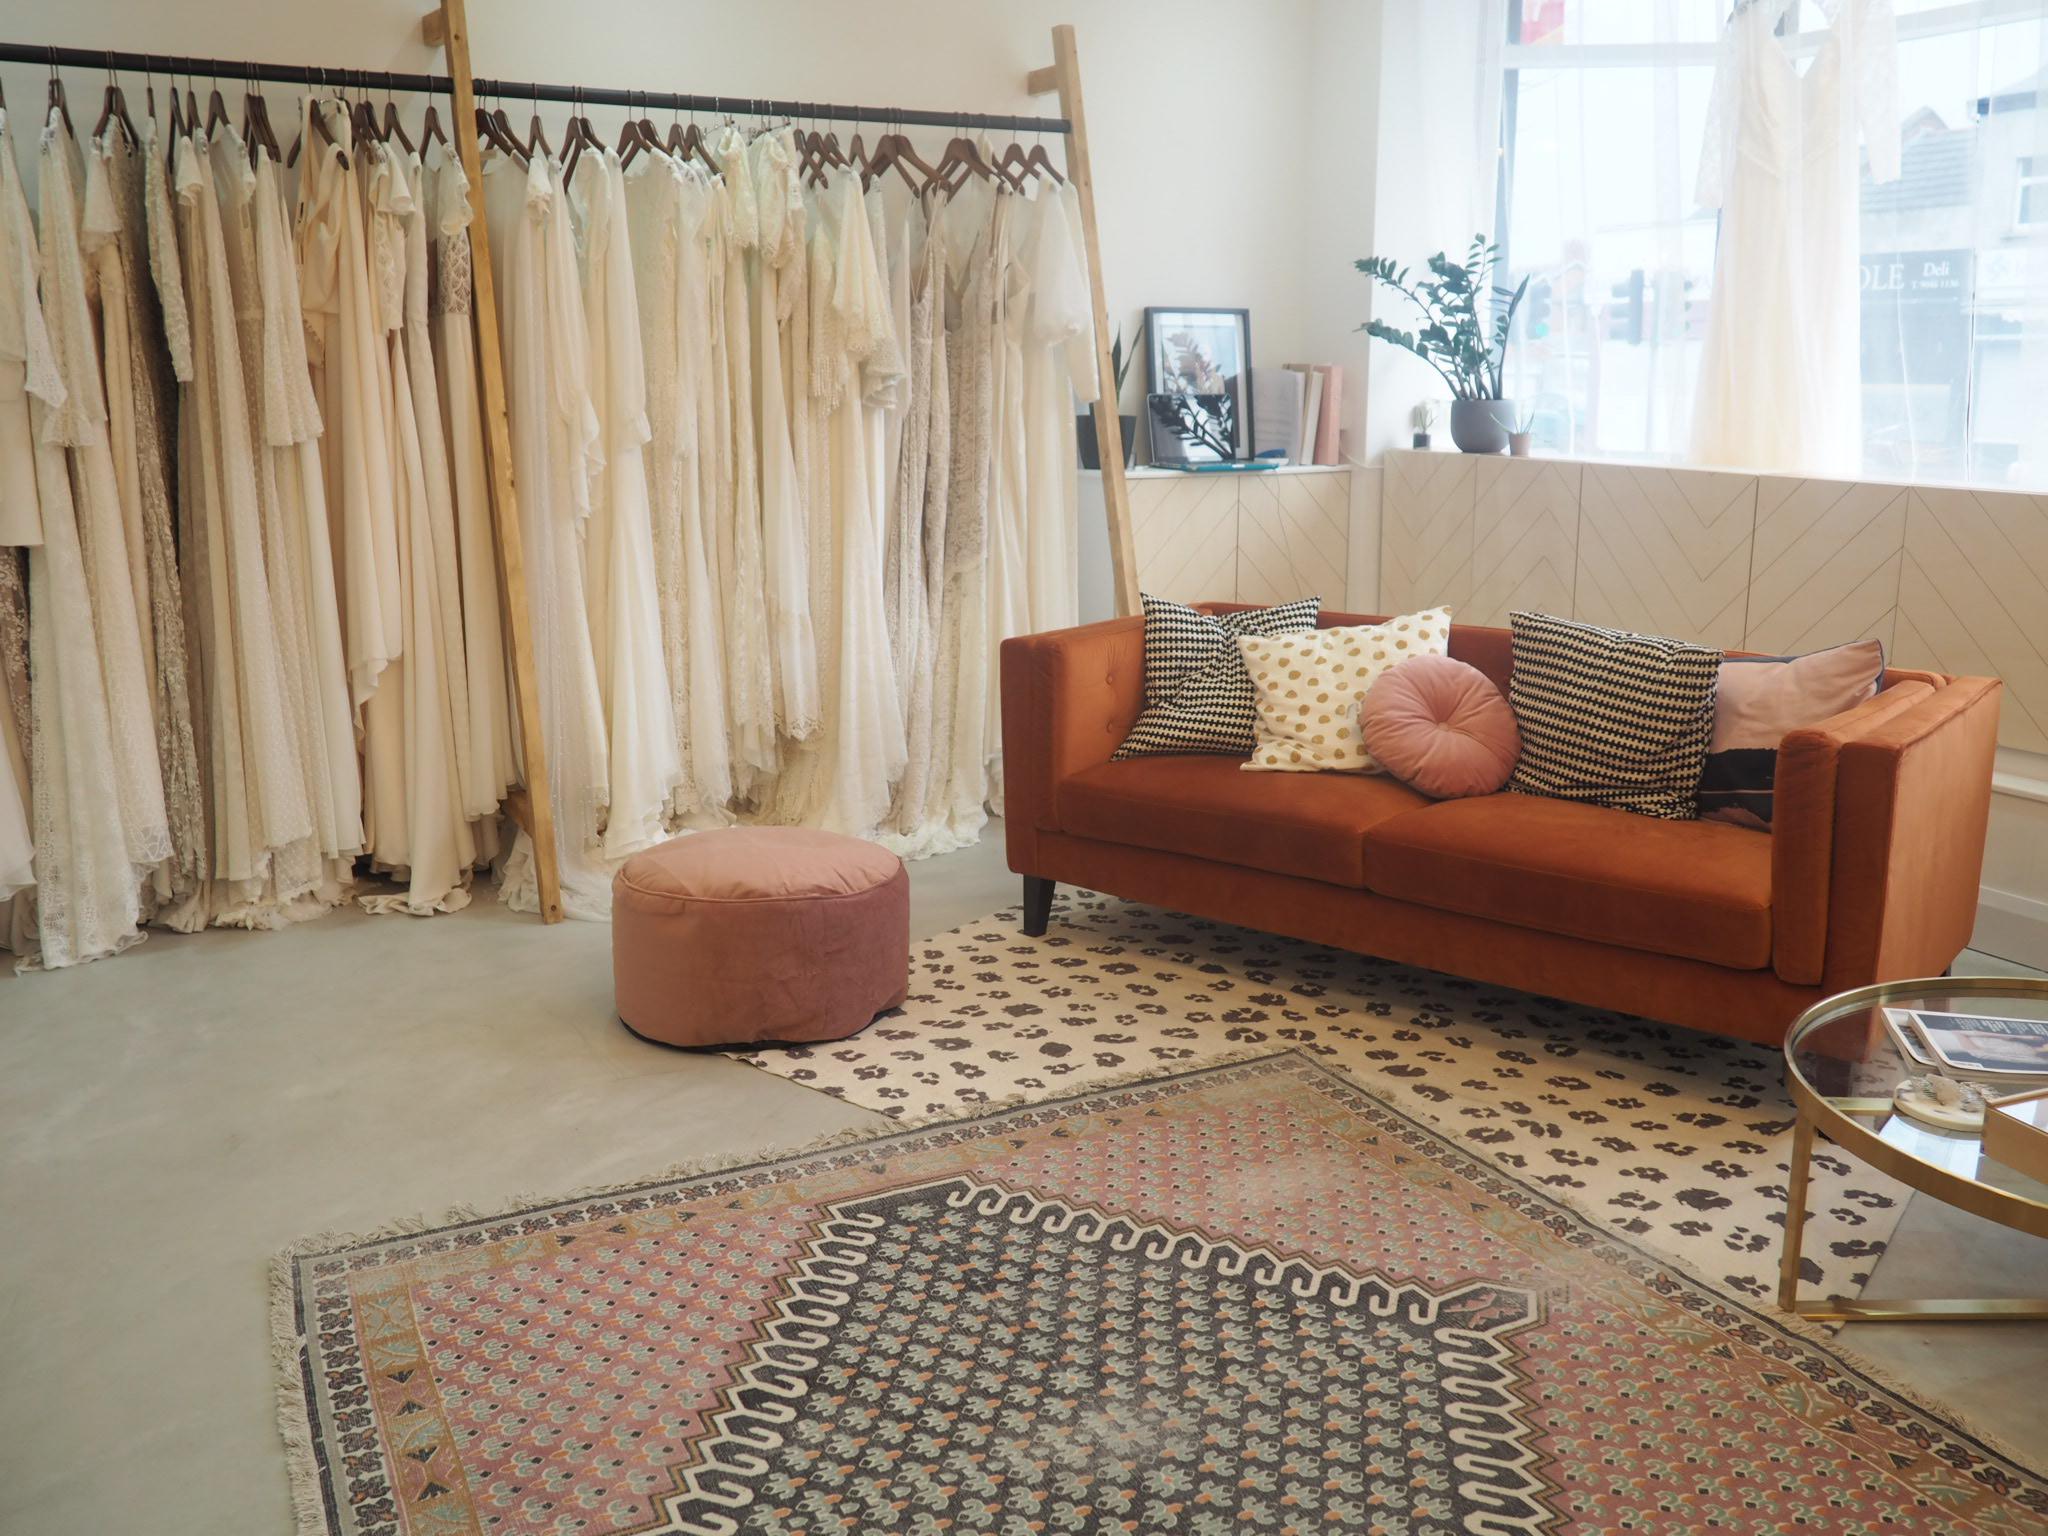 boho inspired decor to make you feel super relaxed.